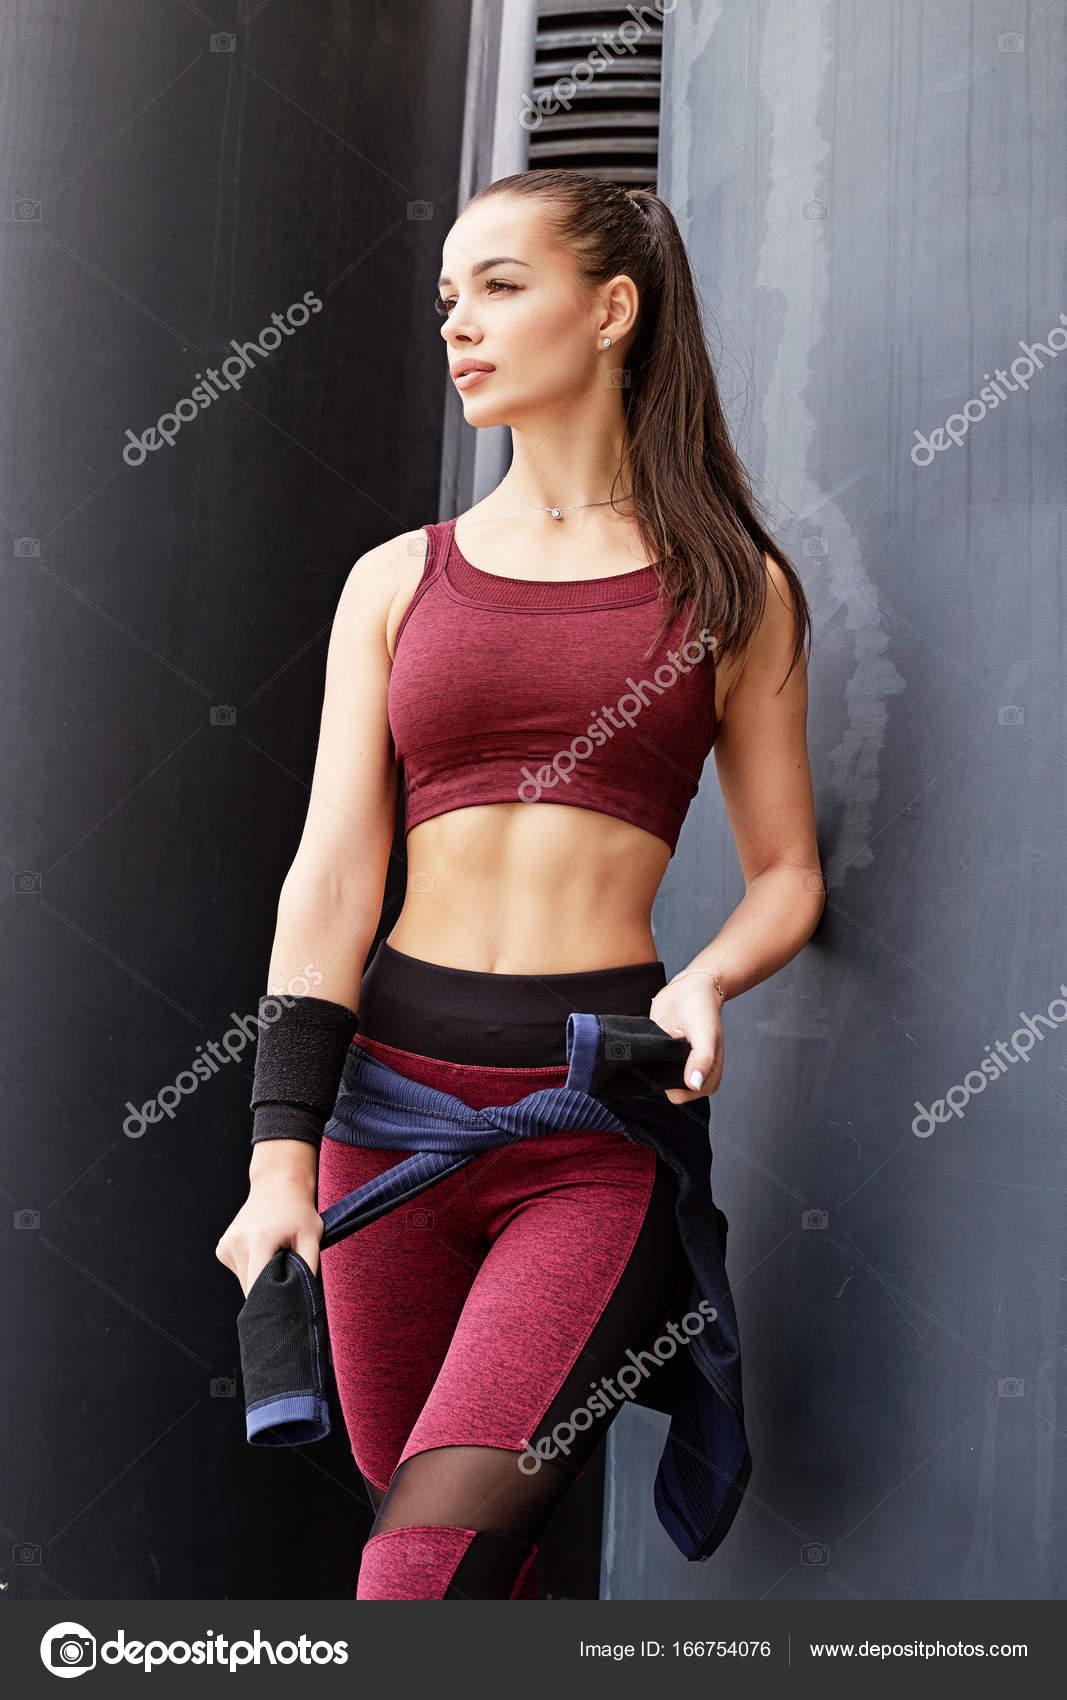 Фитнес девушка модель фото работа онлайн курчатов